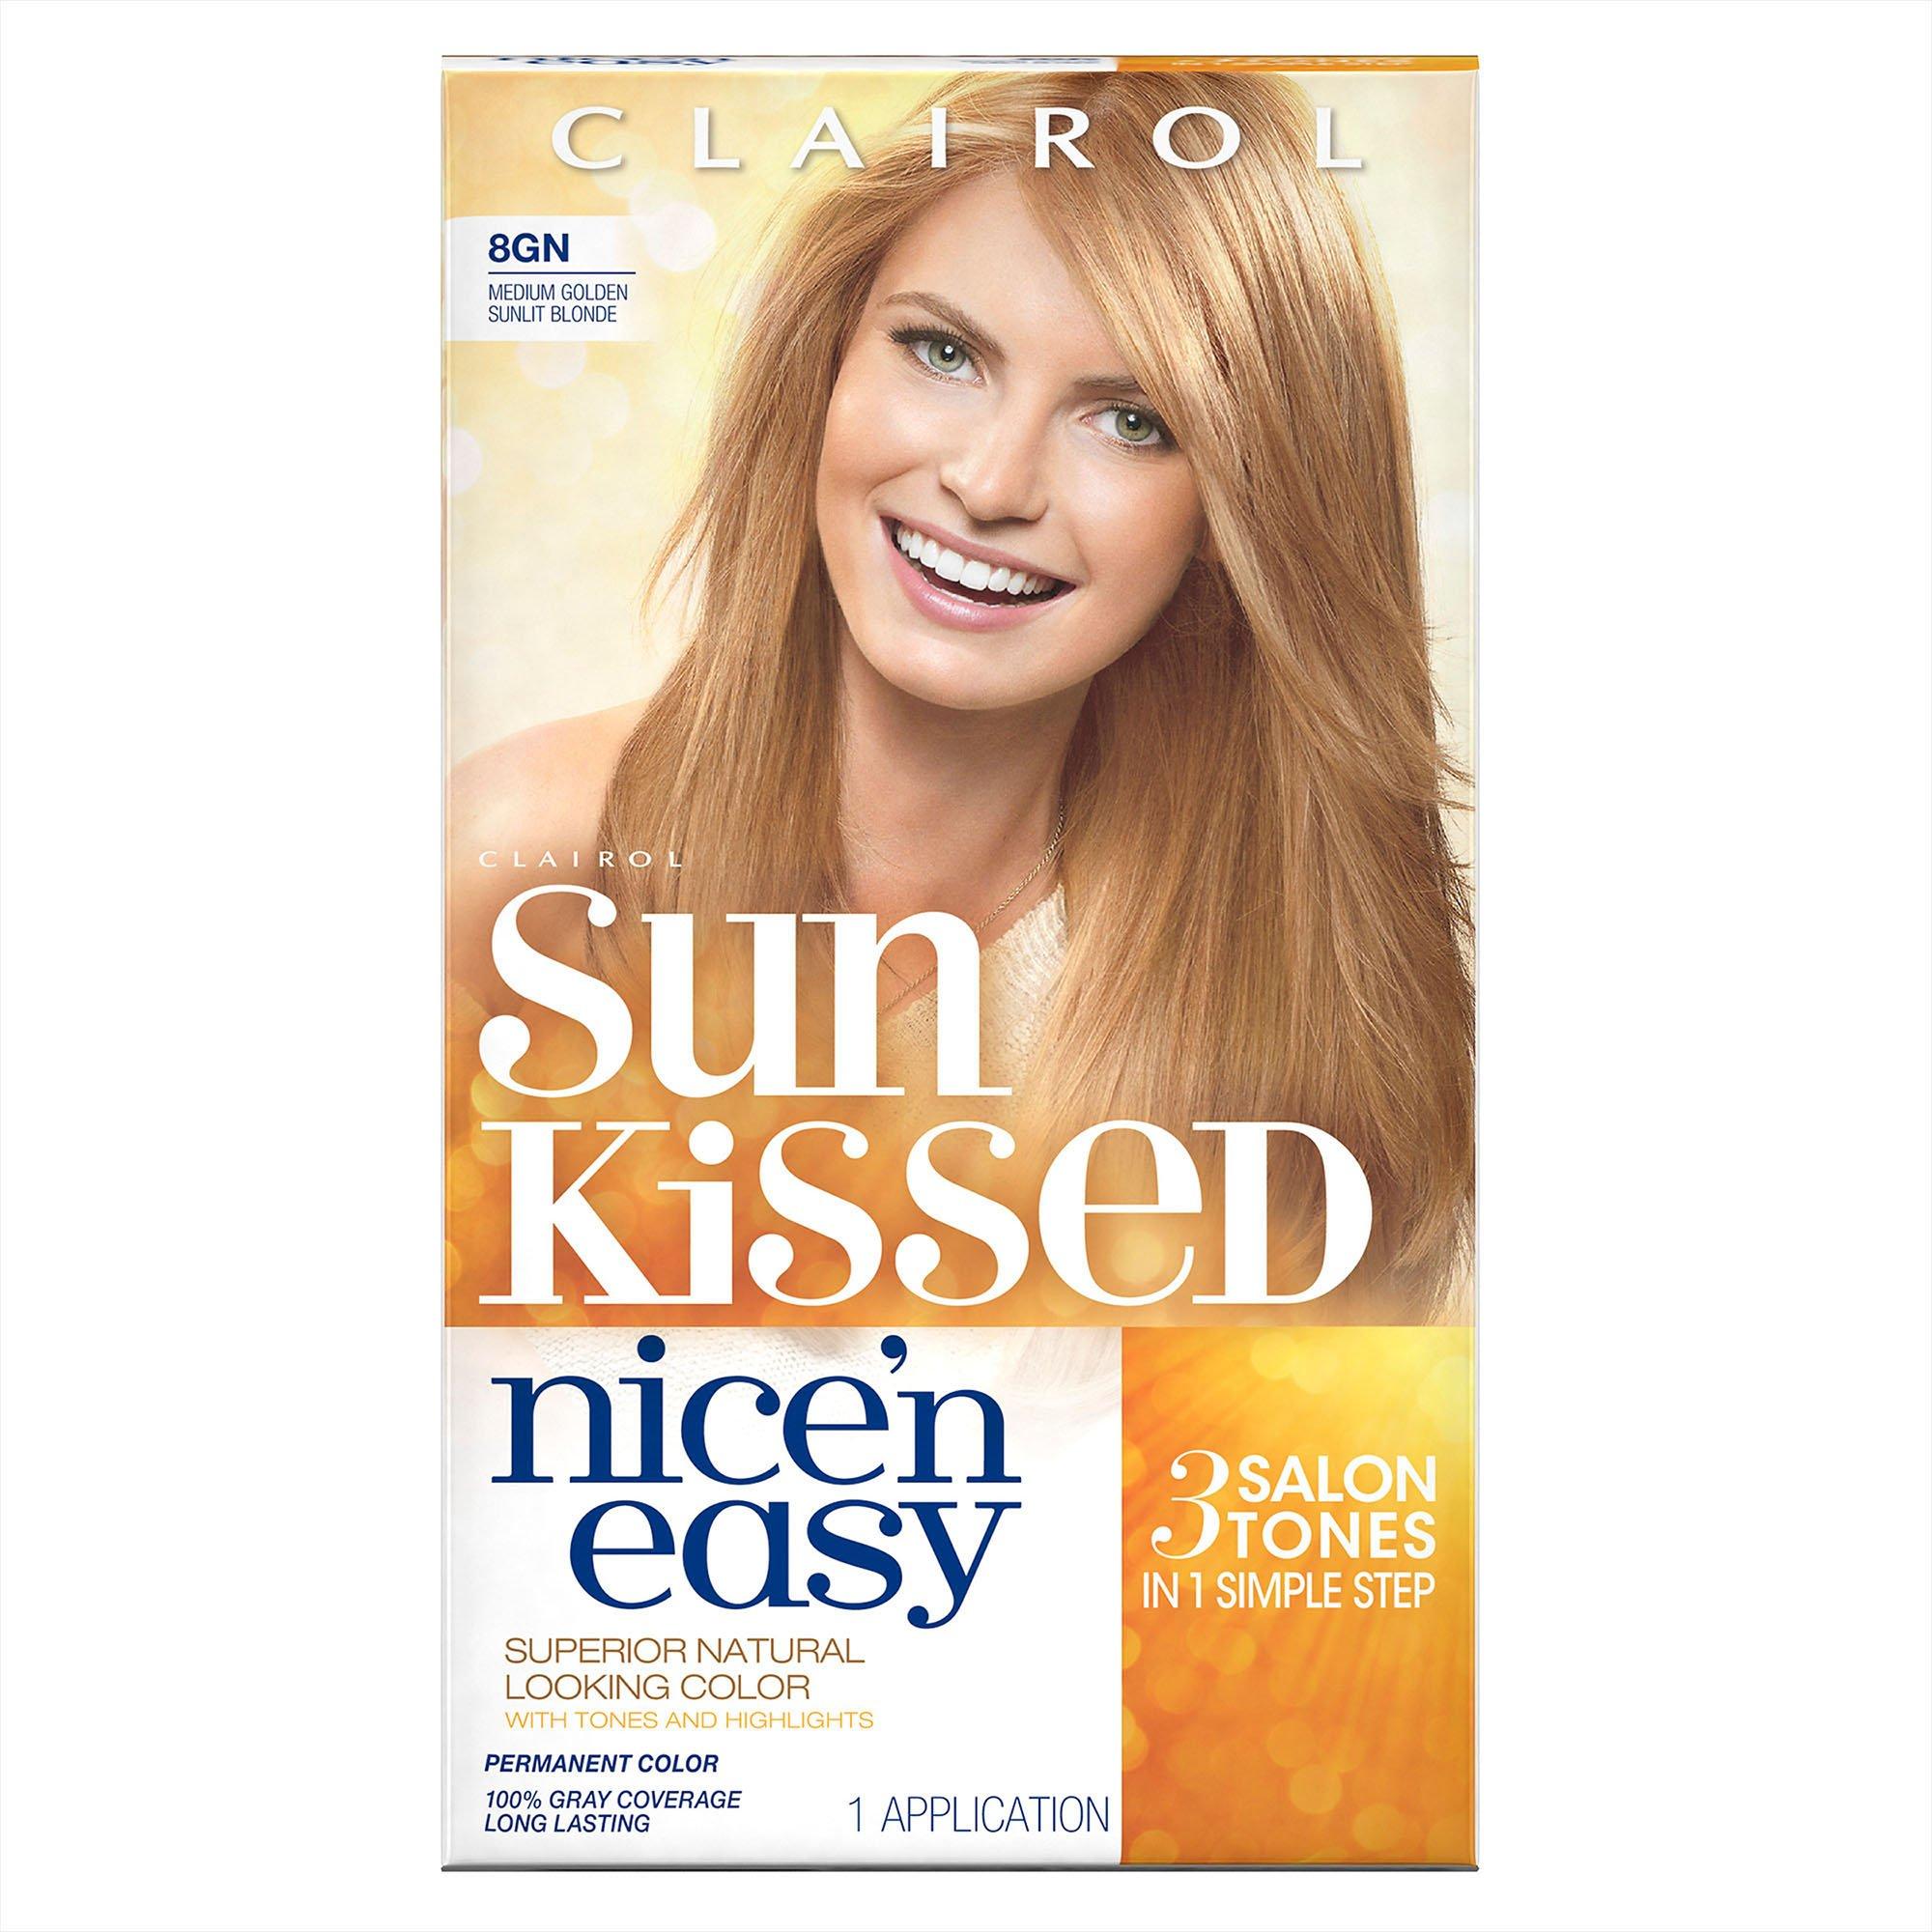 Clairol Nice 'n Easy, 8GN Medium Golden Sunlit Blonde, Permanent Hair Color, 1 Kit (Packaging may vary)